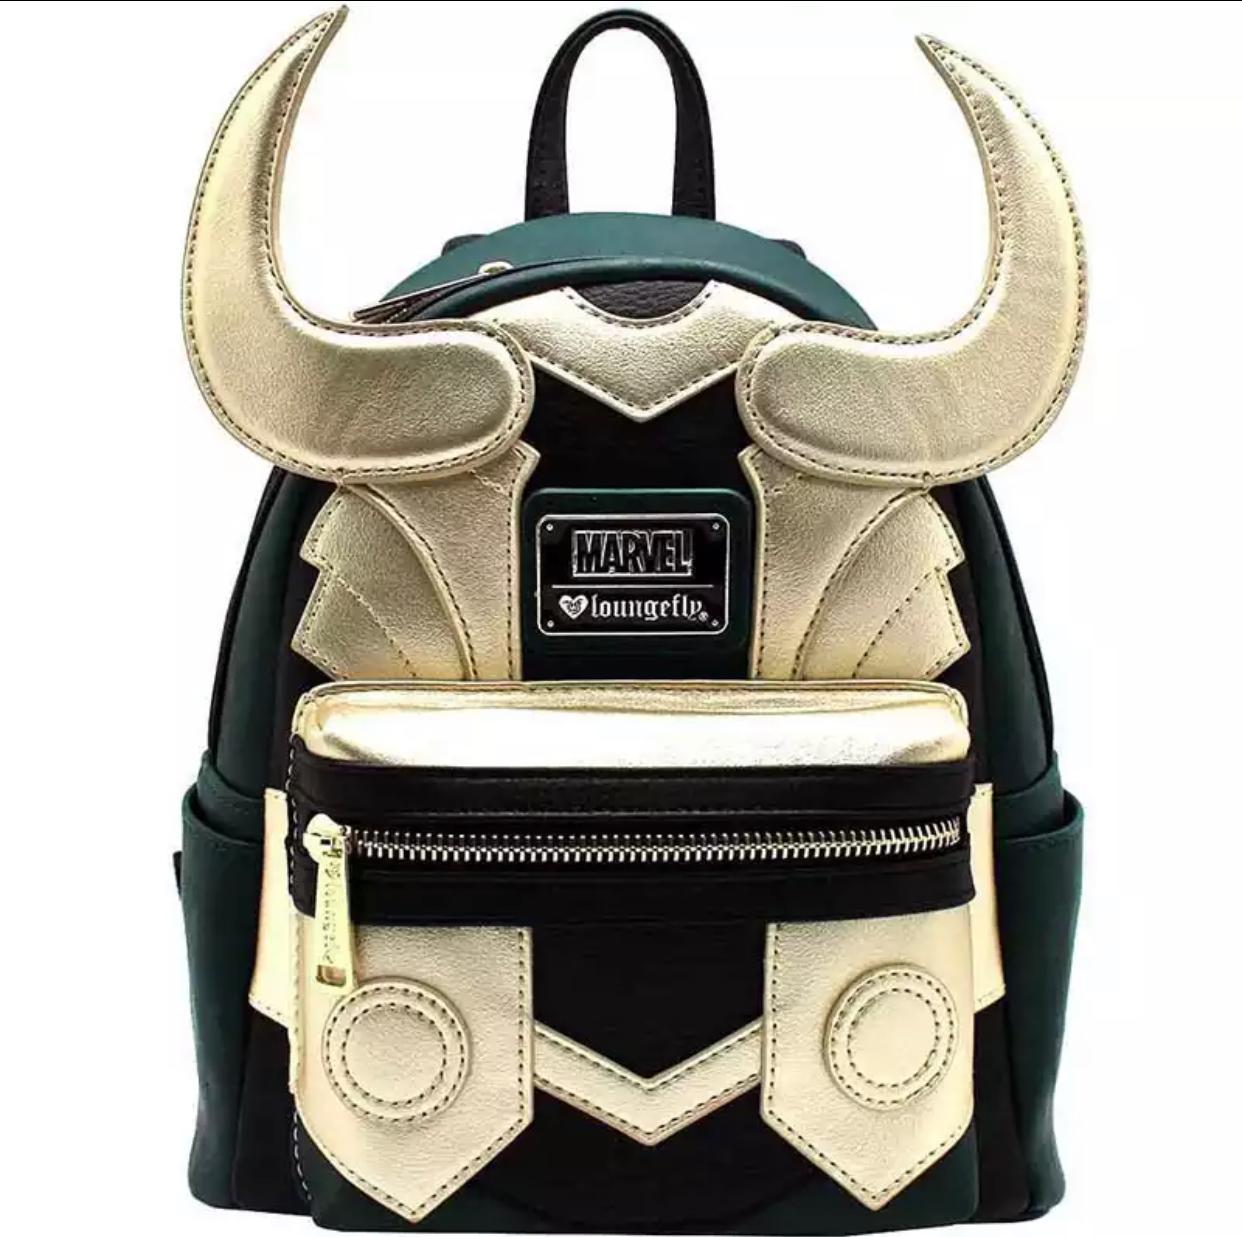 Mochila Geek Loki: Marvel Loungfly - EV